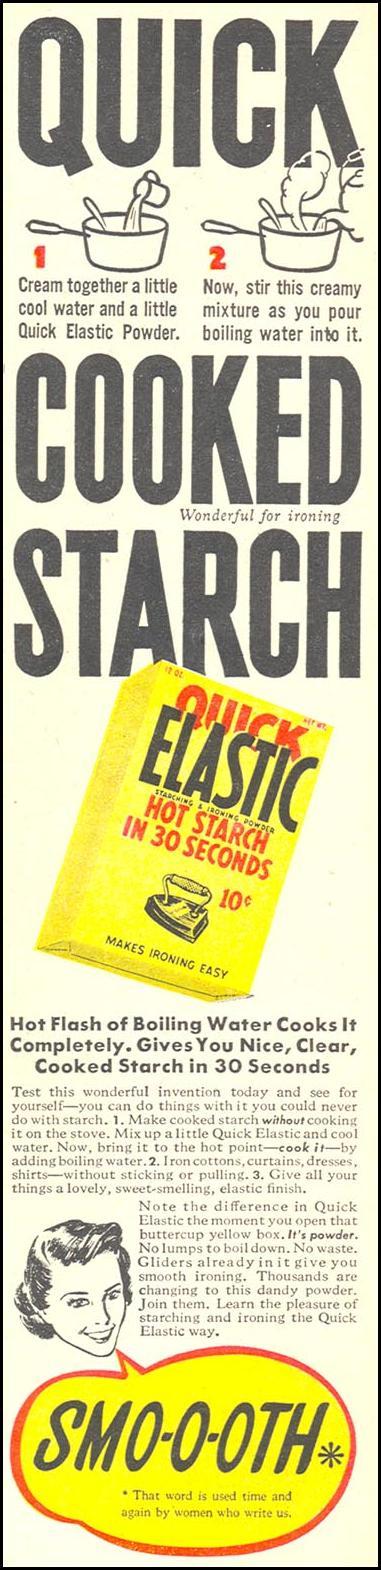 ELASTIC STARCHING & IRONING POWDER WOMAN'S DAY 09/01/1942 p. 3